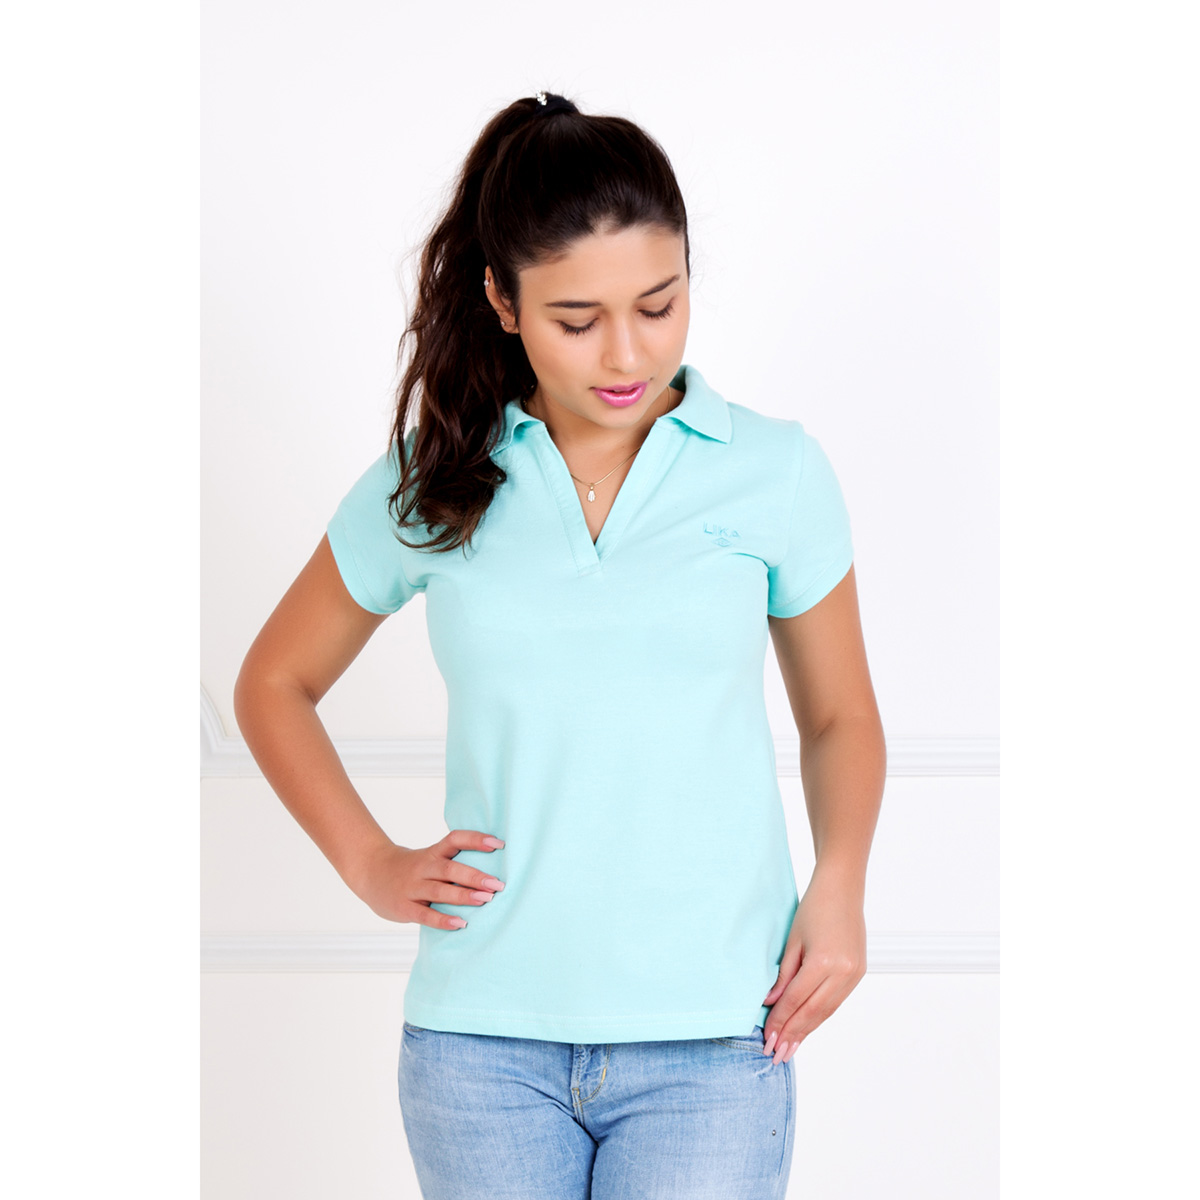 Женская футболка-поло Шерт Ментол, размер 48Блузки, майки, кофты<br>Обхват груди:96 см<br>Обхват талии:78 см<br>Обхват бедер:104 см<br>Рост:167 см<br><br>Тип: Жен. футболка<br>Размер: 48<br>Материал: Пике